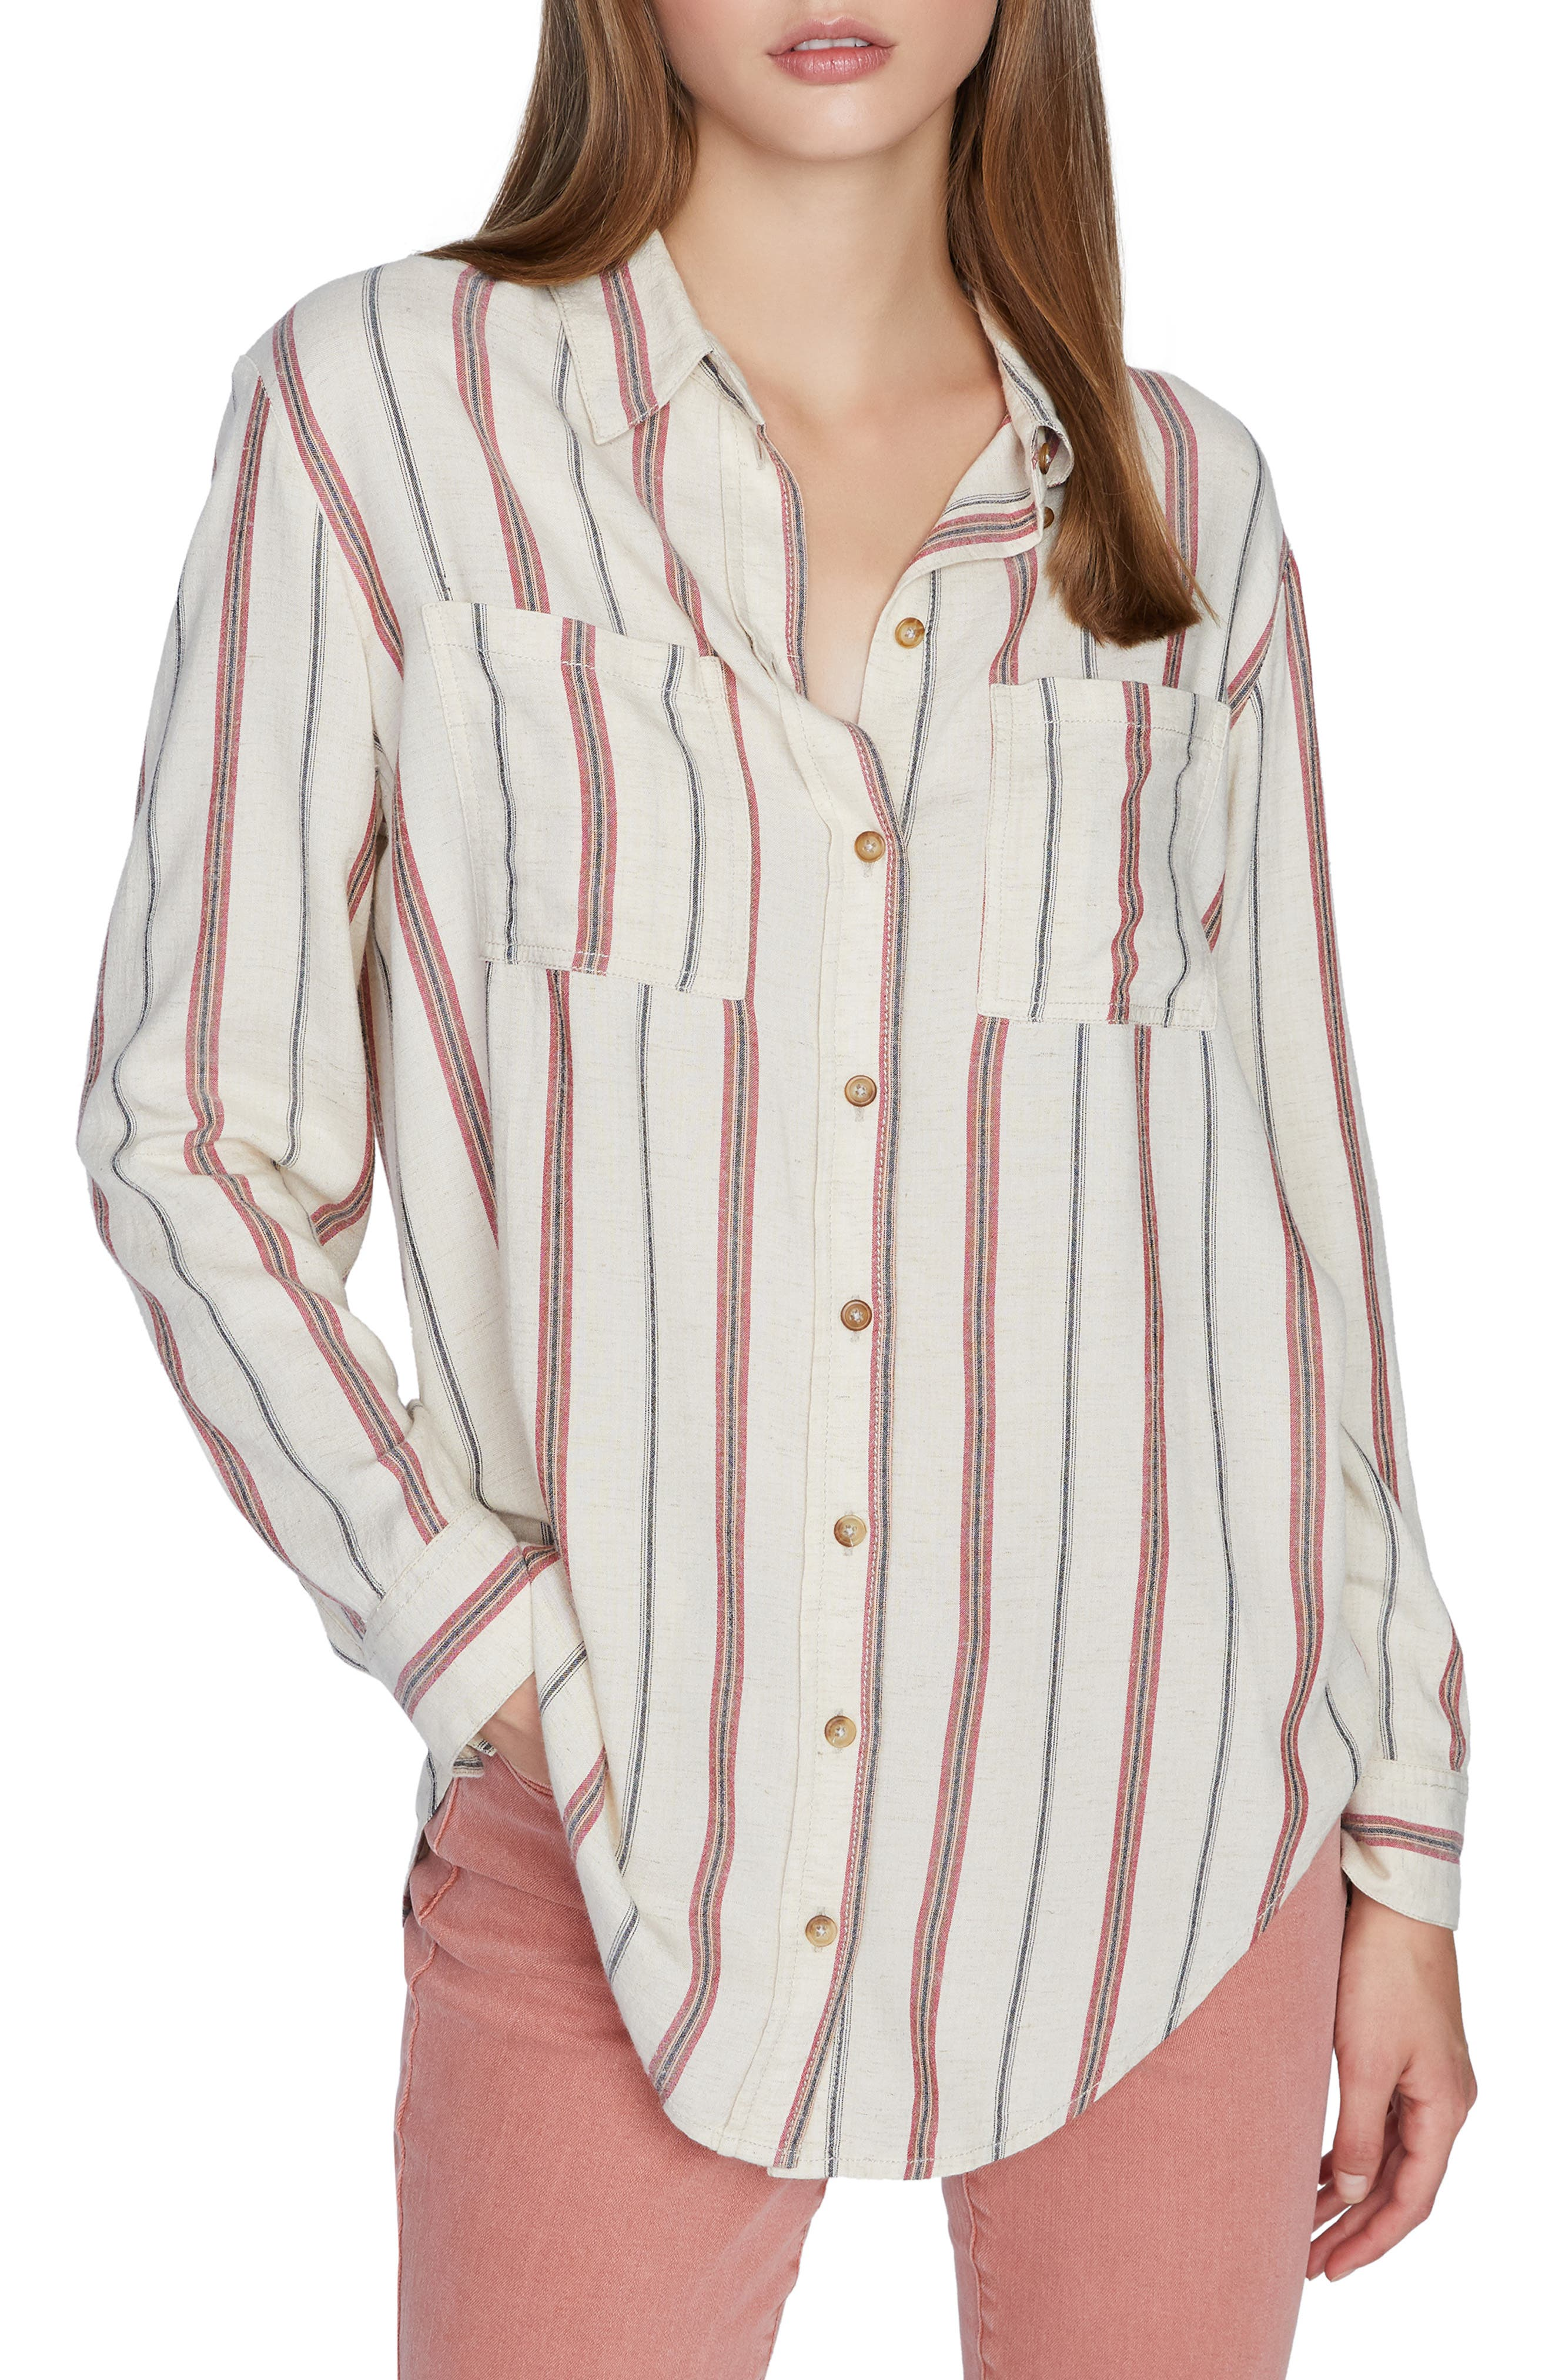 Image of Sanctuary Paradise Cove Striped Tunic Shirt